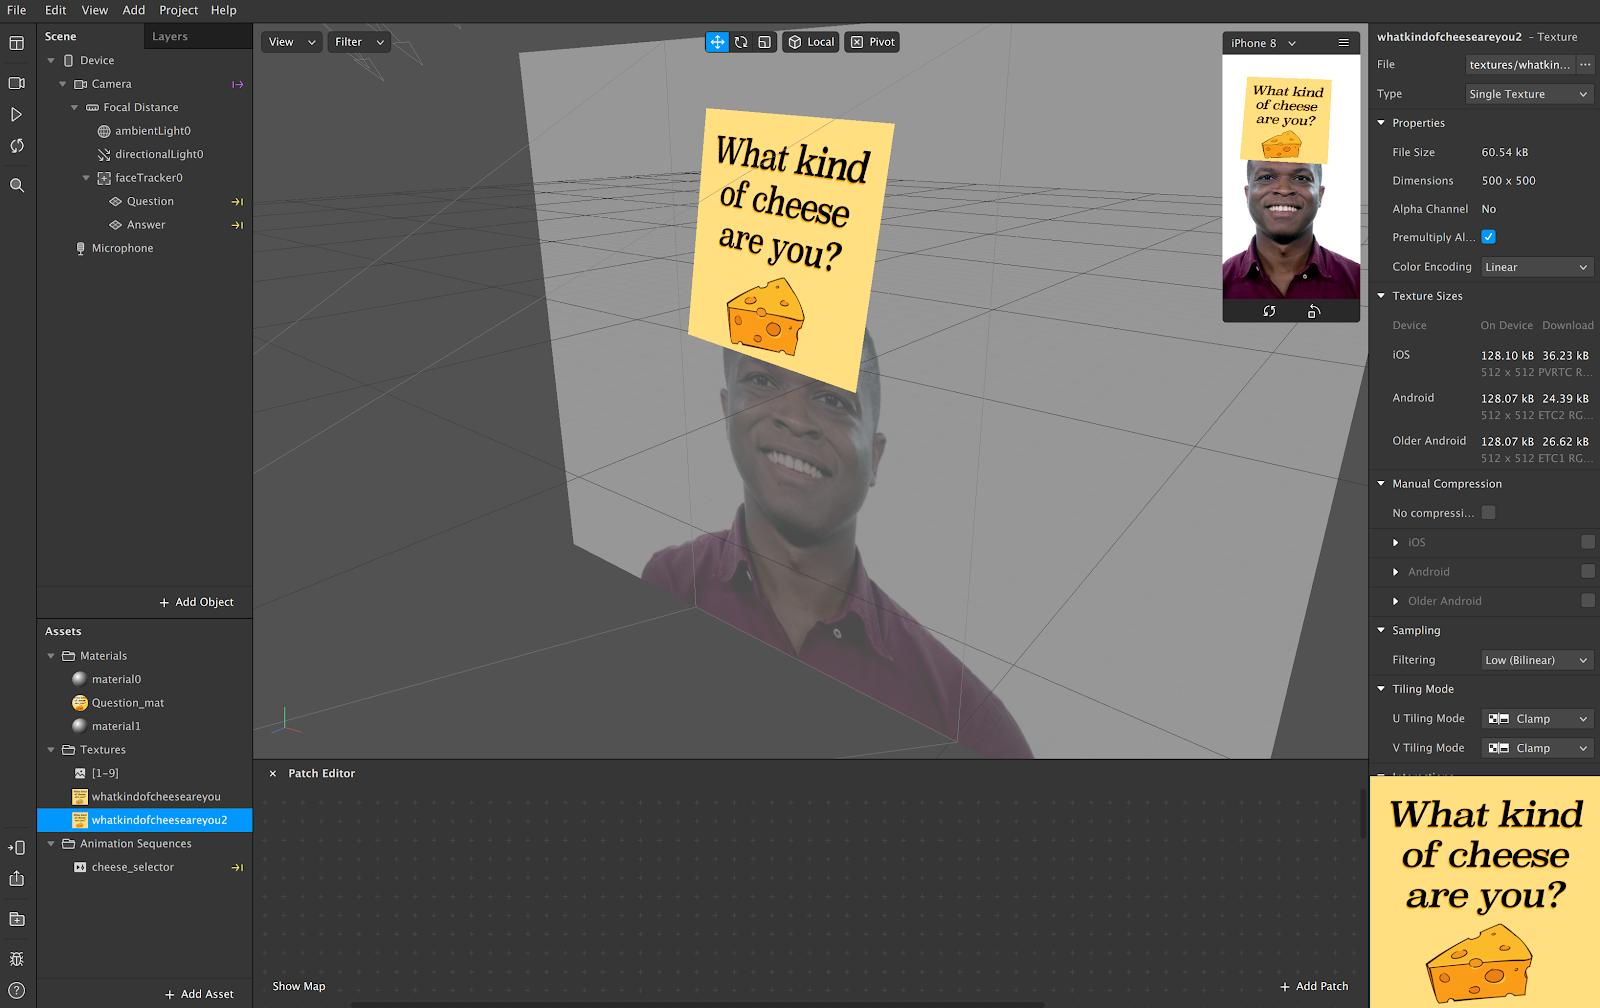 Quiz Lenses being developed on Spark AR